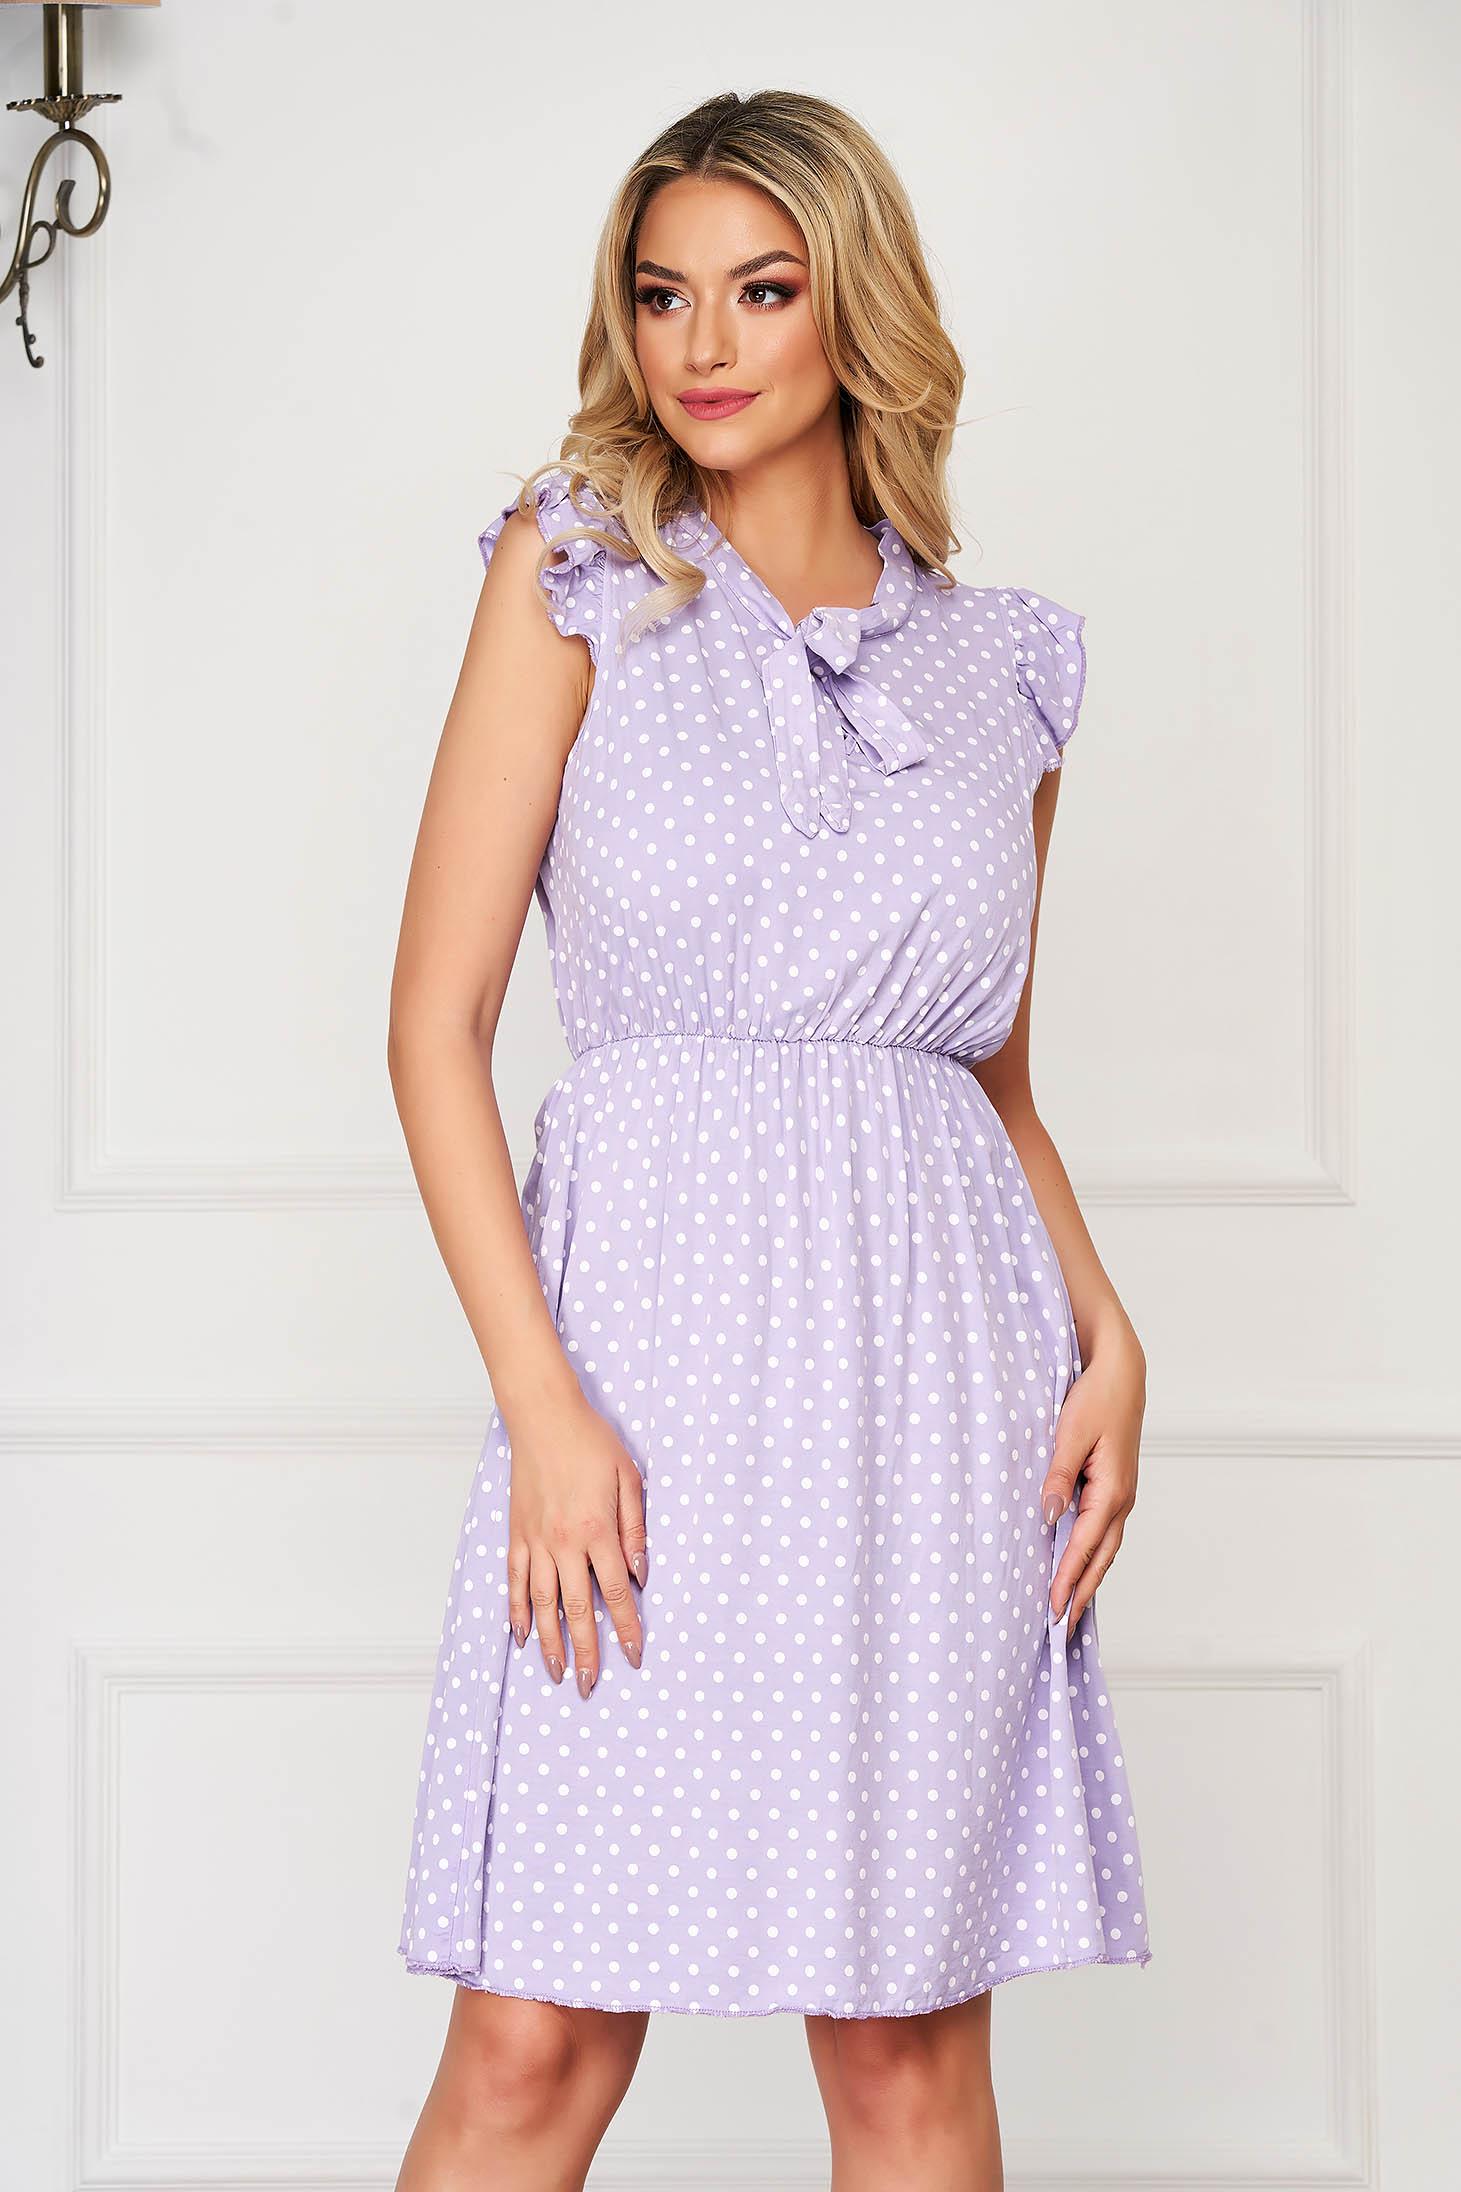 Lila dress short cut daily cloche with elastic waist airy fabric